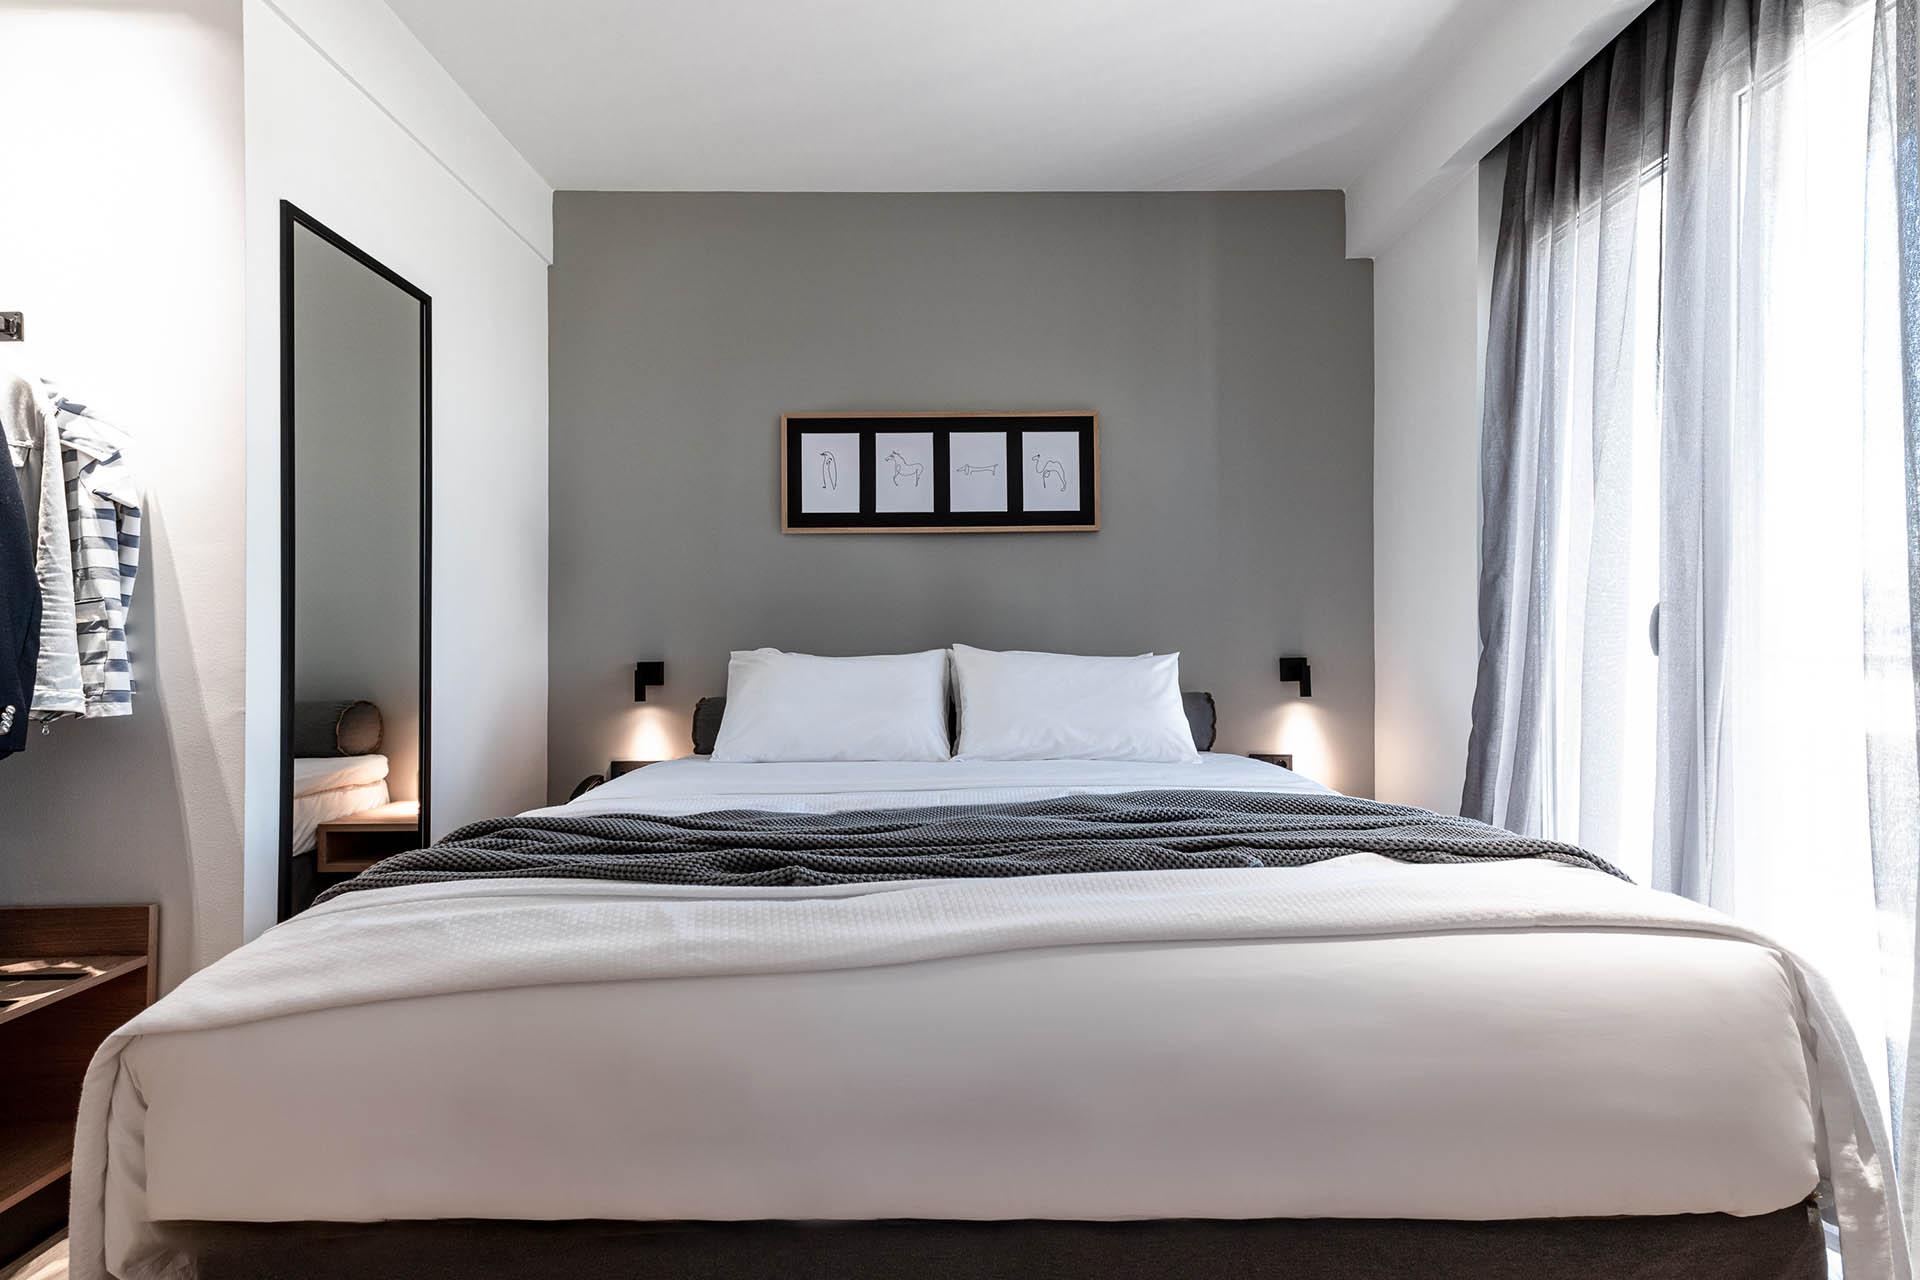 31 Doors Hotel - Αλεξανδρούπολη ✦ 2 Ημέρες (1 Διανυκτέρευση) ✦ 2 άτομα ✦ Πρωινό ✦ 01/09/2020 έως 30/09/2020 ✦ Free Wi-Fi